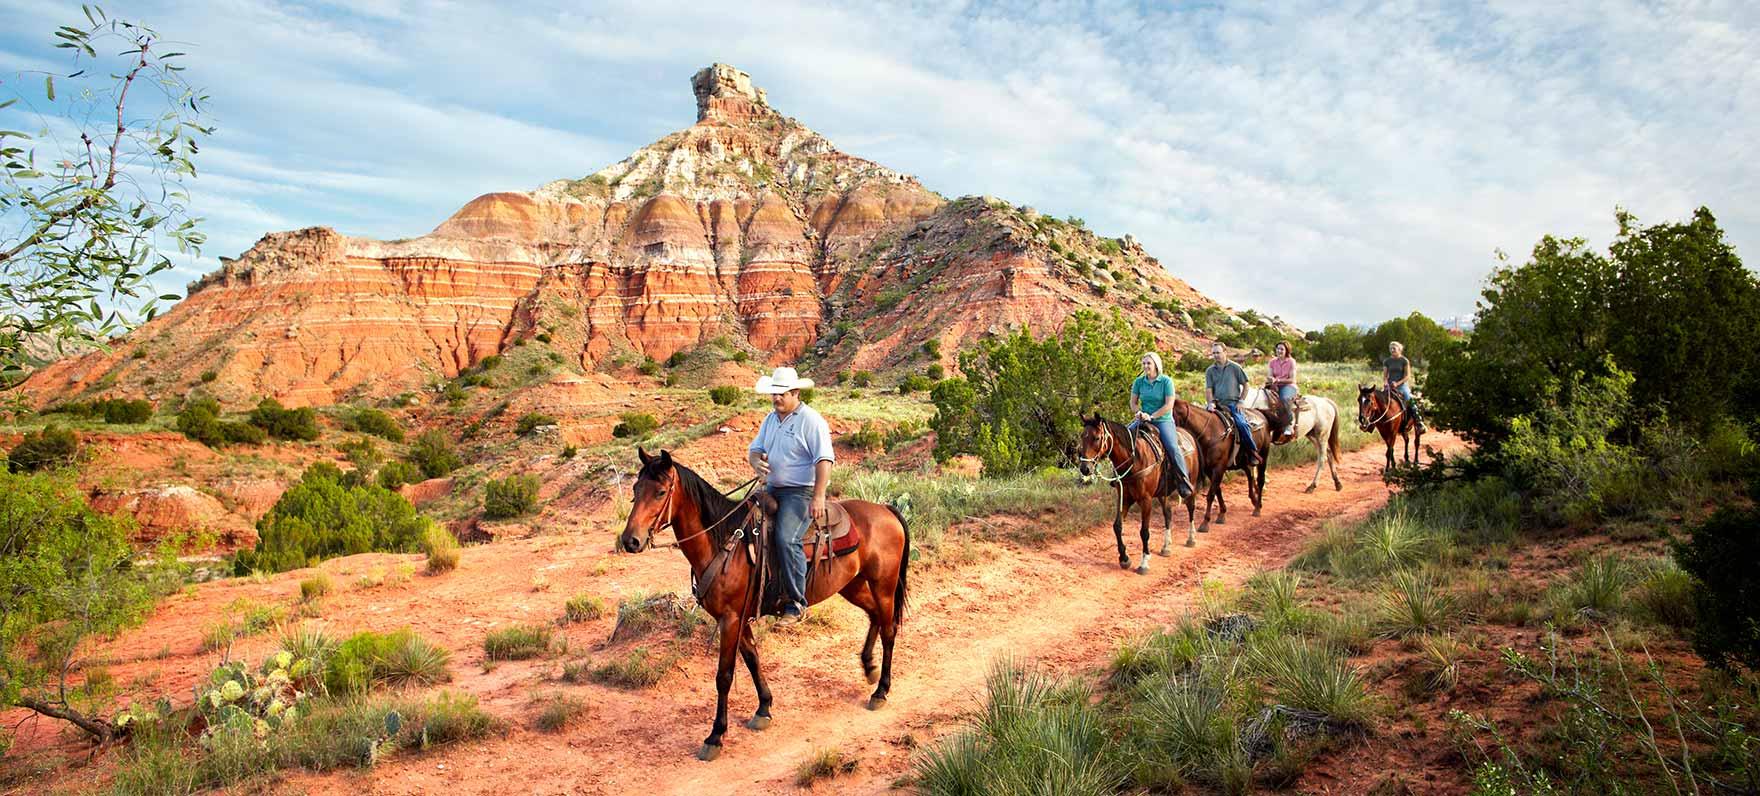 Palo Duro Canyon Tours